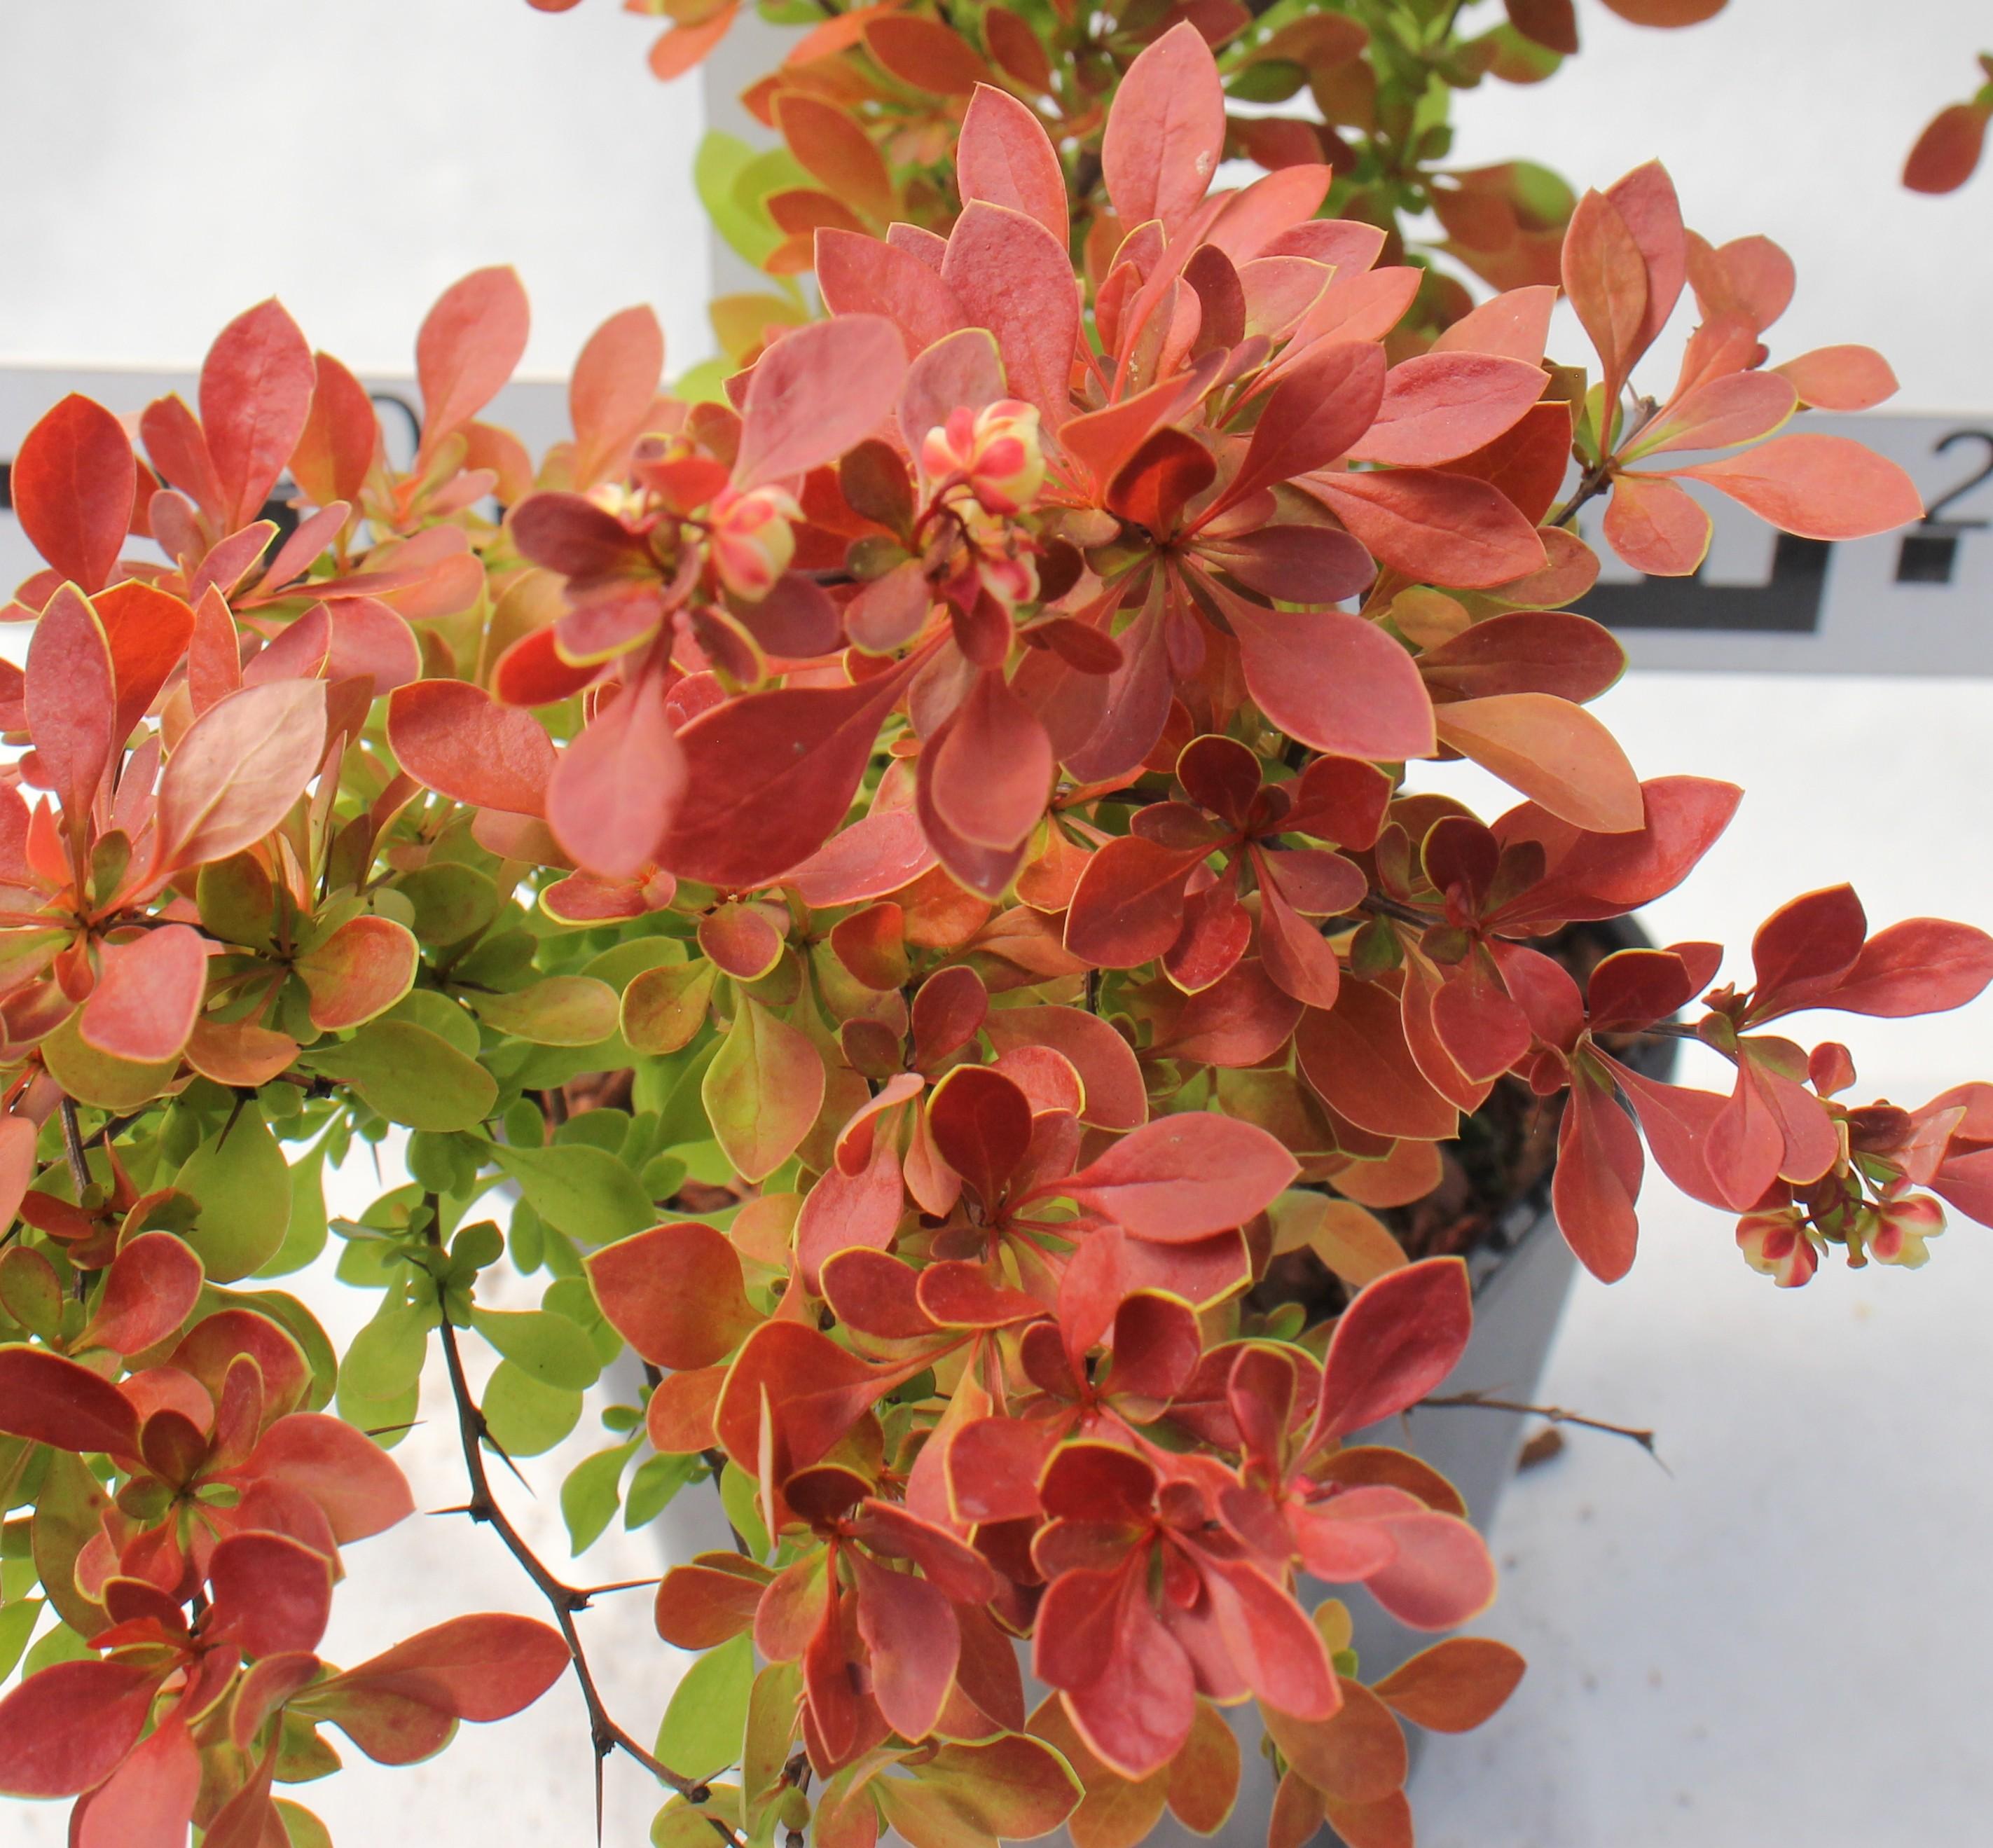 Berberis thunbergii 'Coral' PBR